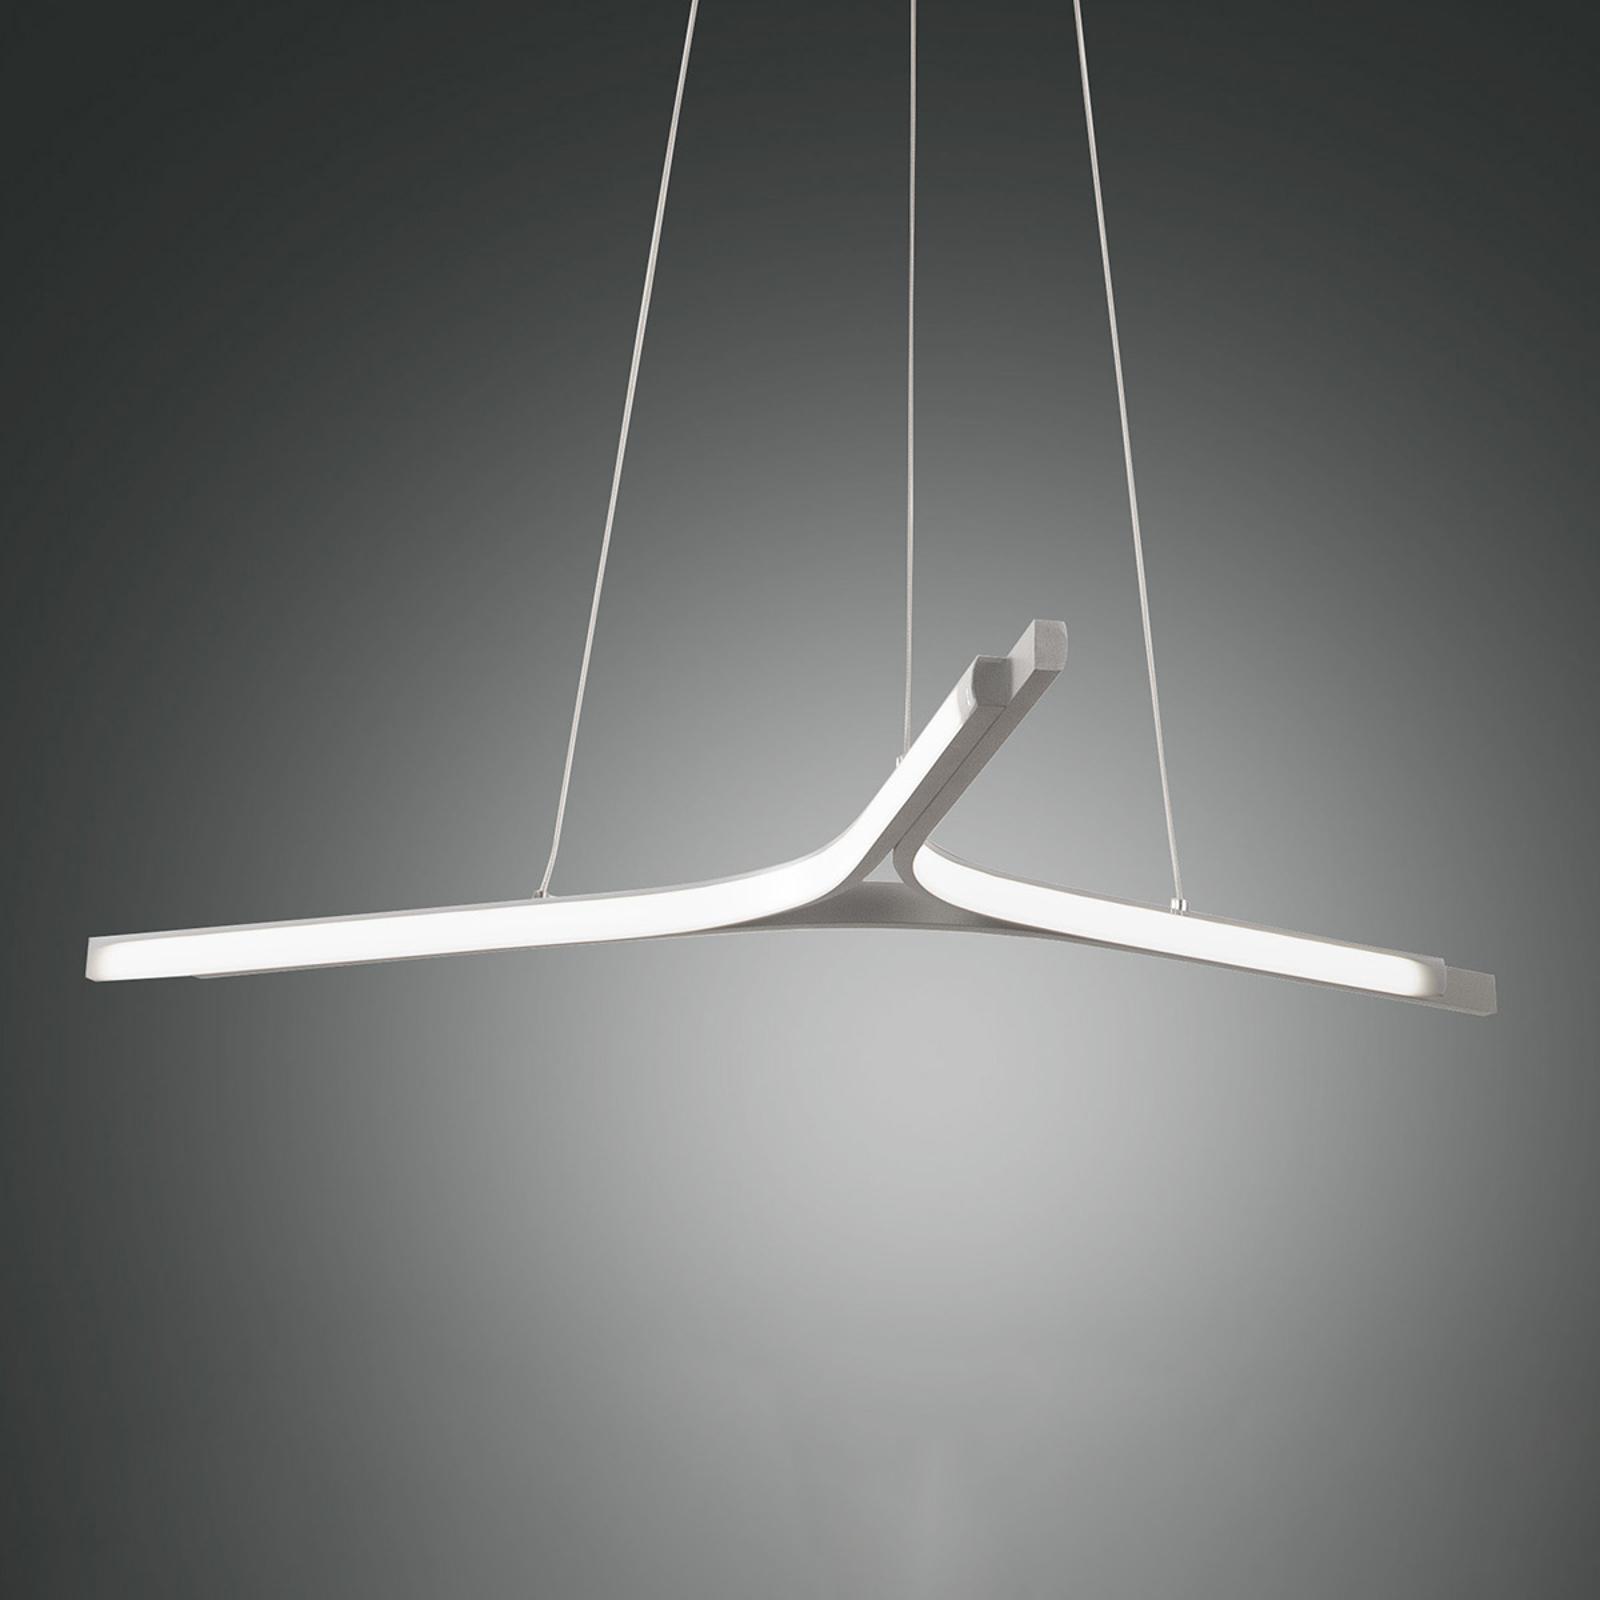 Lampa wisząca LED Lira, ściemniana, srebrna